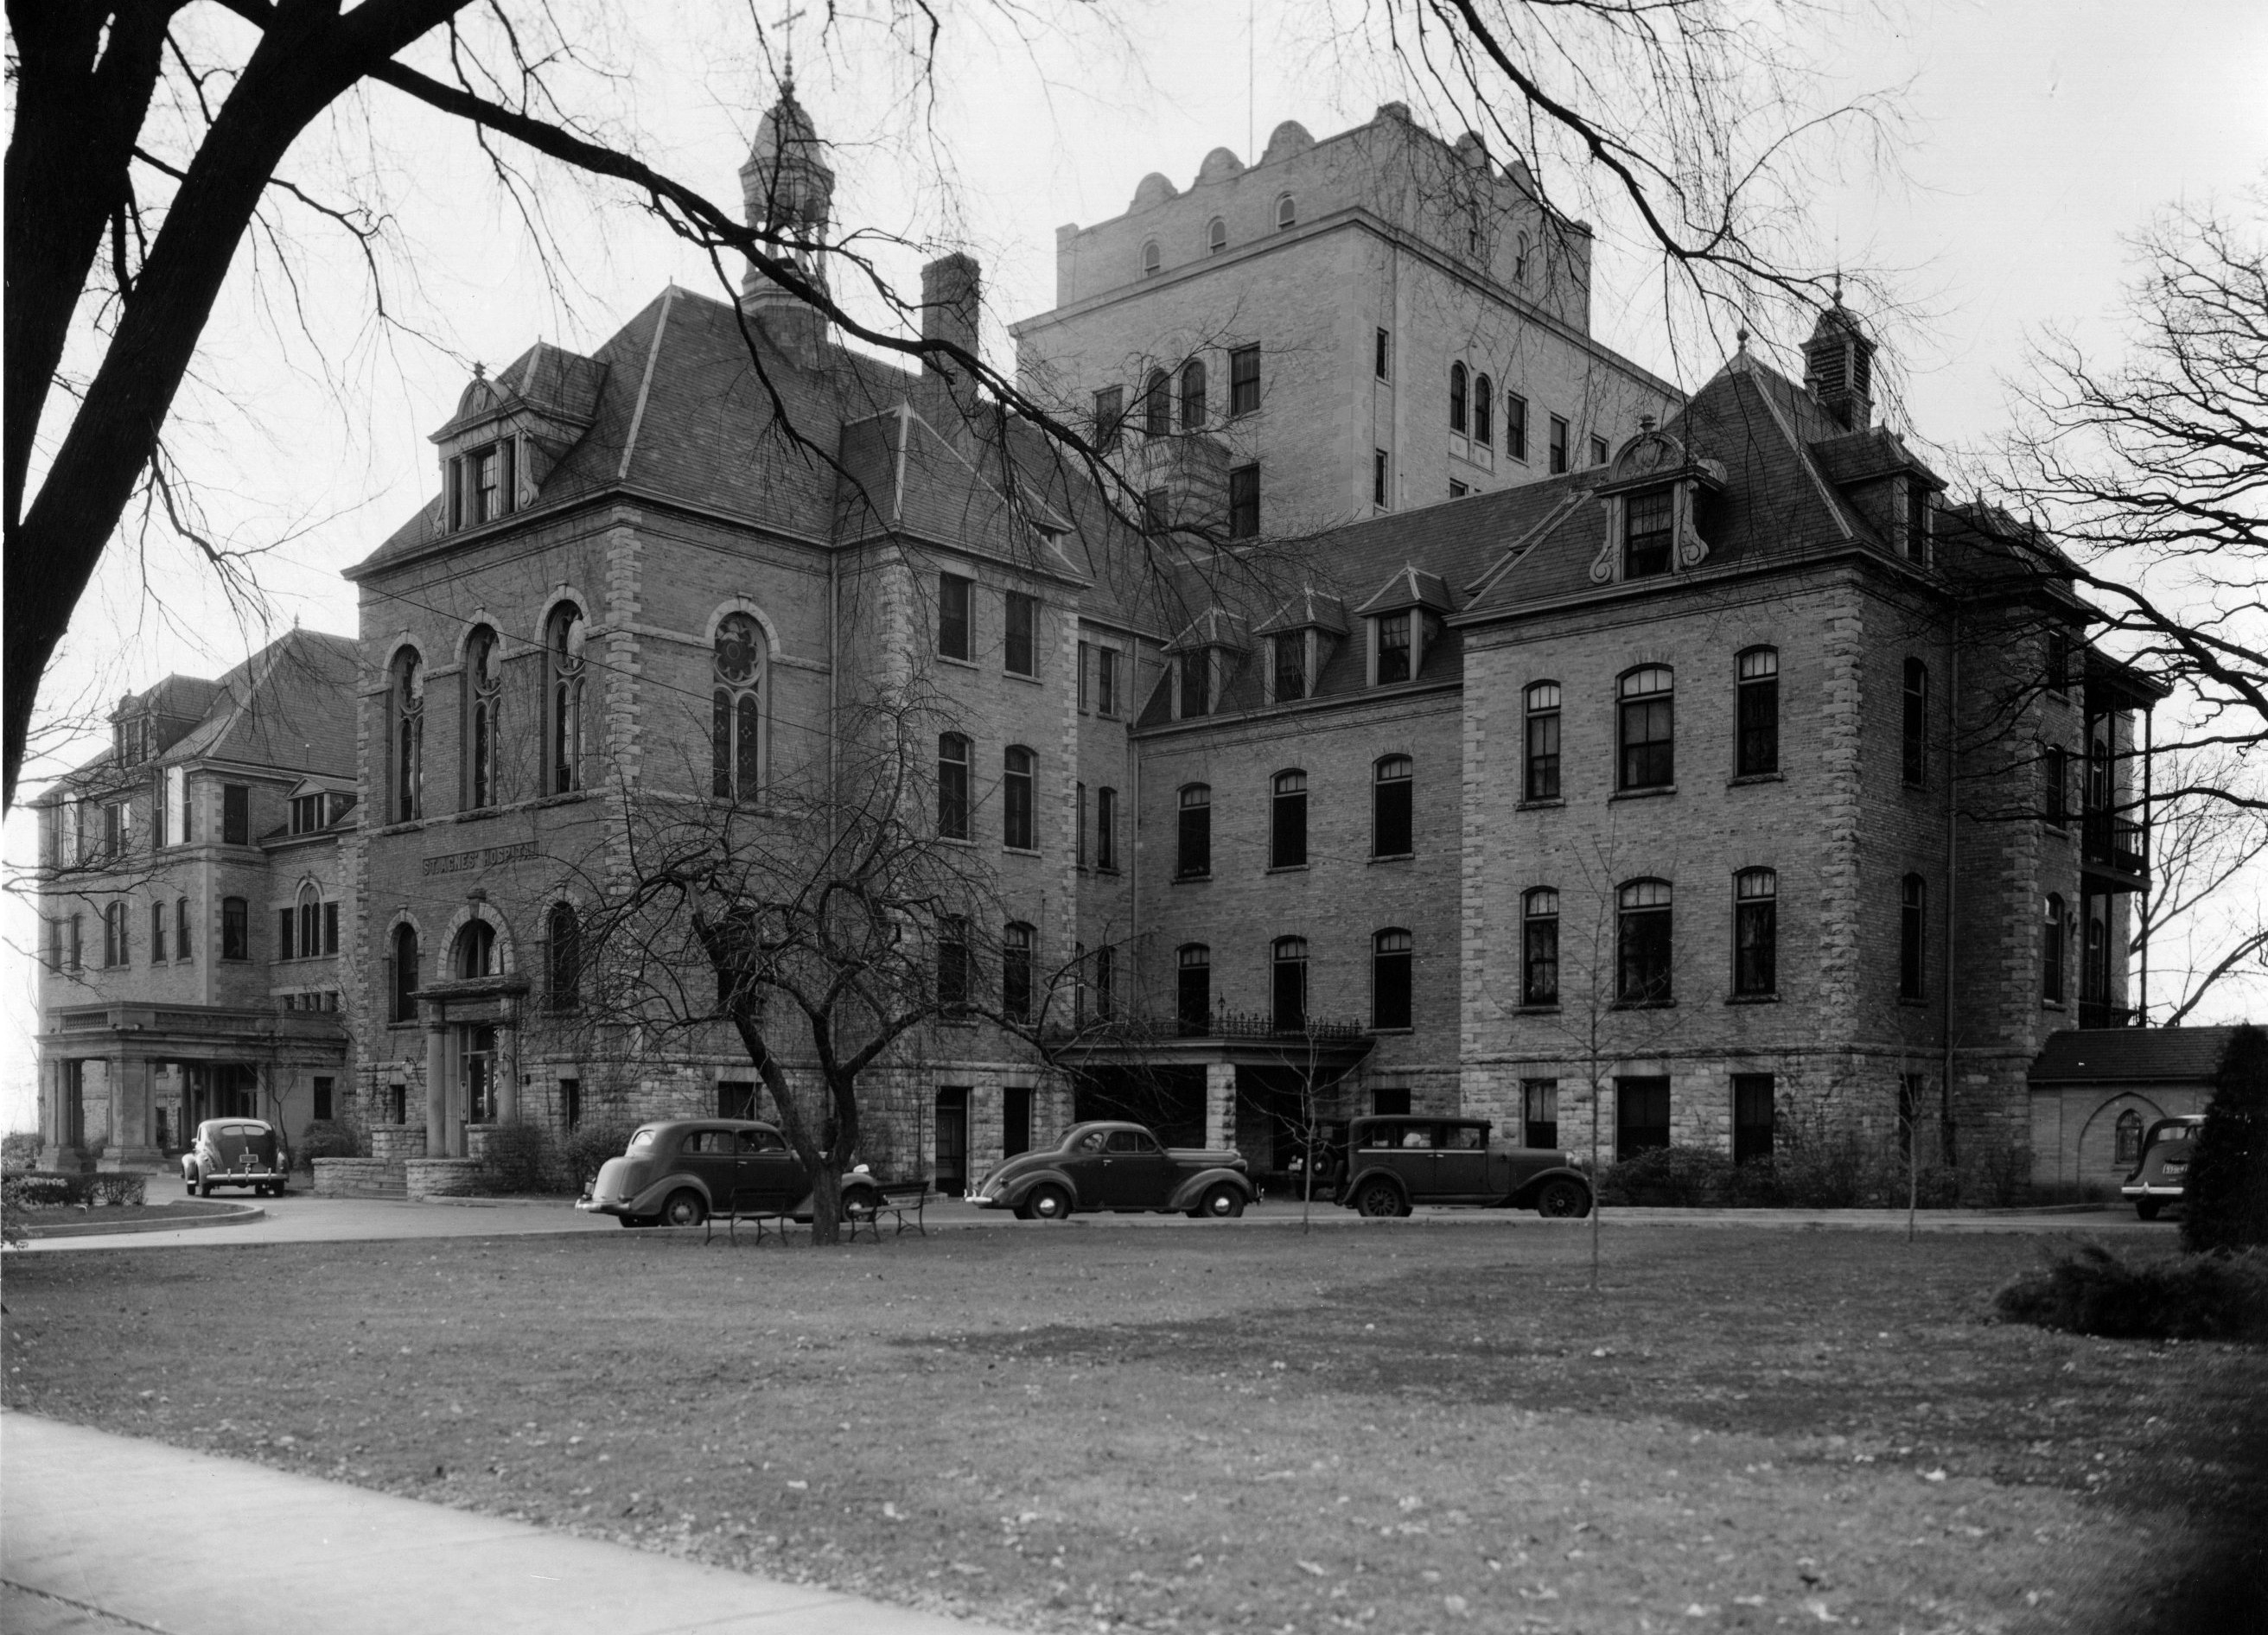 St. Agnes Hospital, 1930s